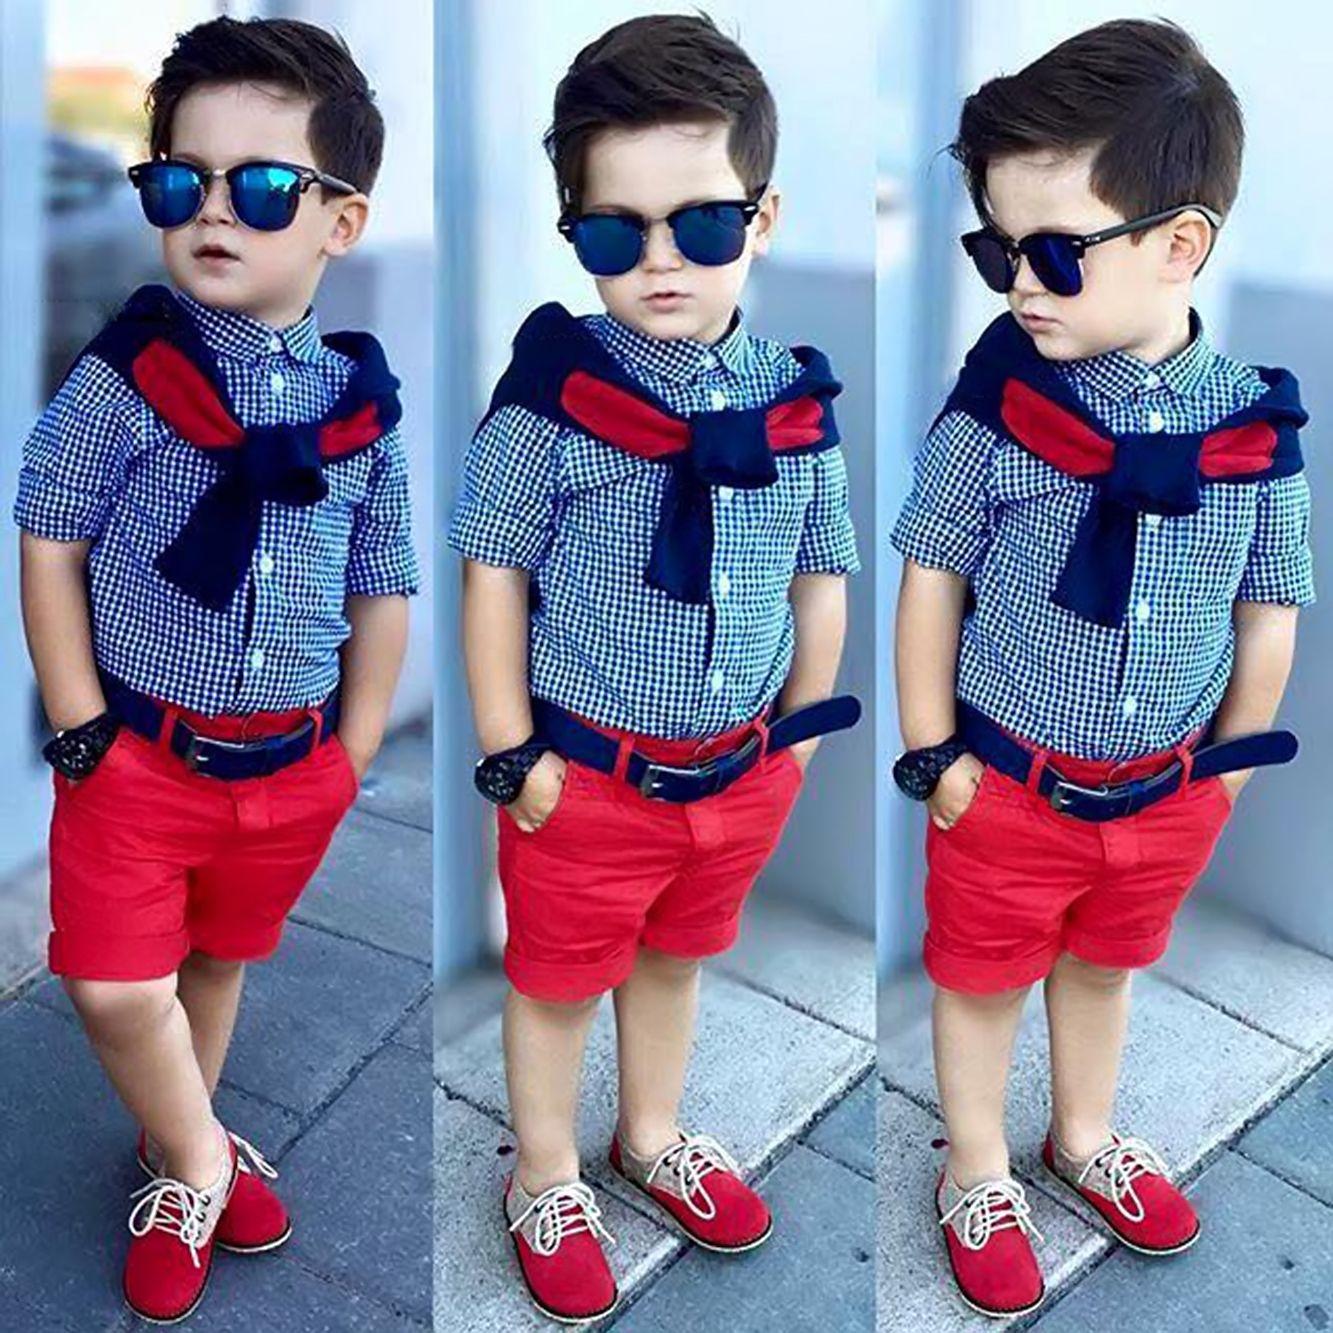 Pin by Saurabh Singh on Smart Boys | Pinterest | Boy fashion, Baby ...